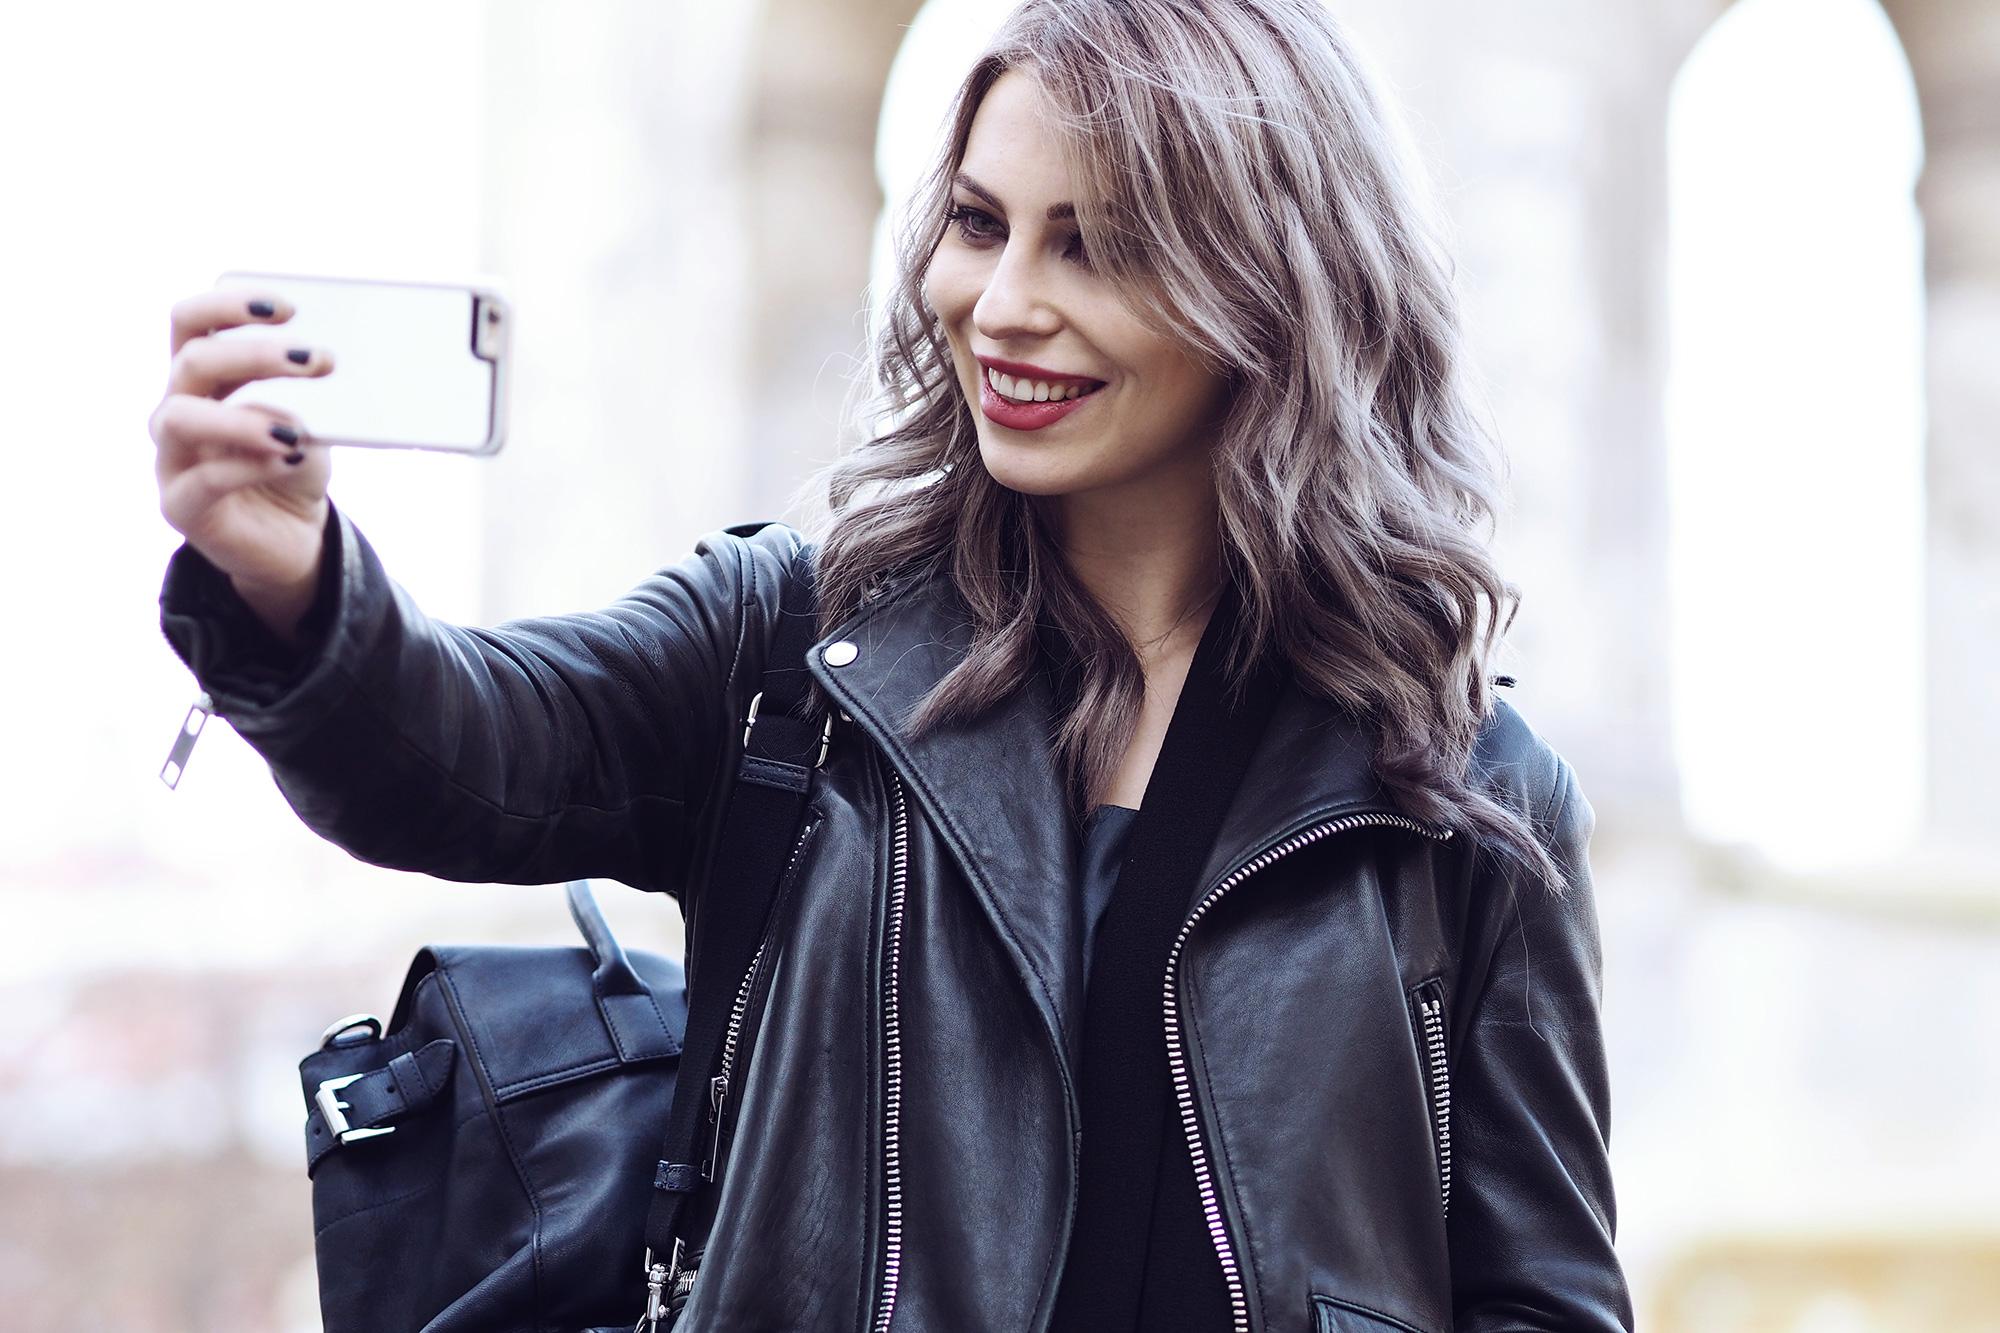 das-perfekte-selfie-2